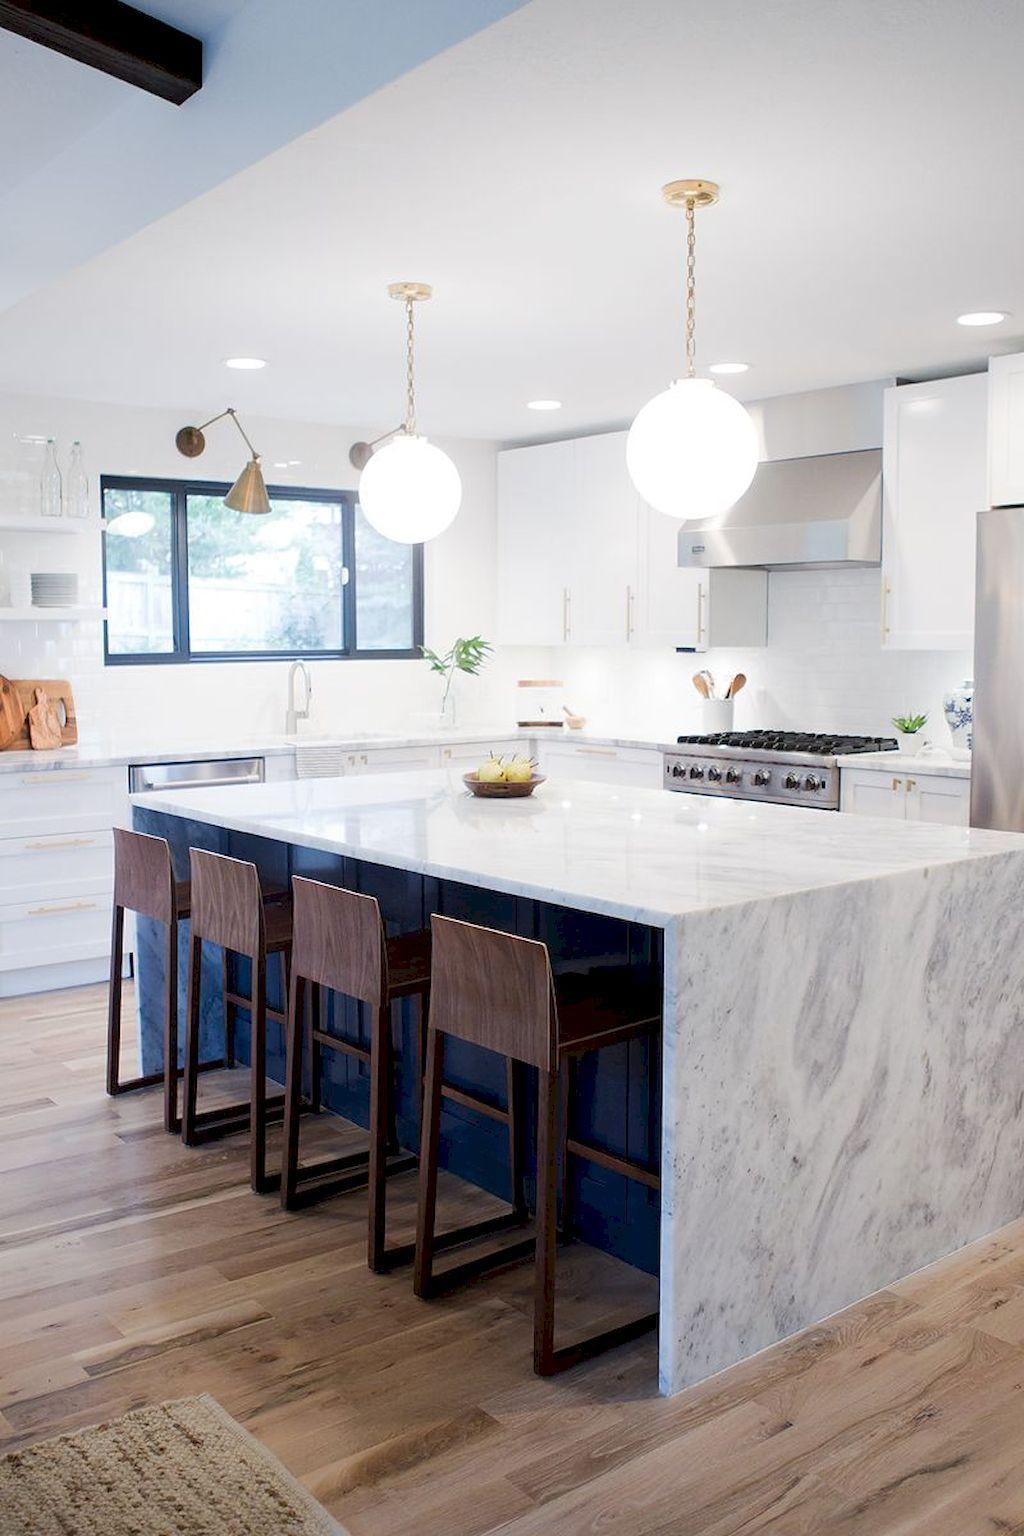 50 Mid Century Modern Kitchen Design Ideas | Kitchens, Future and House